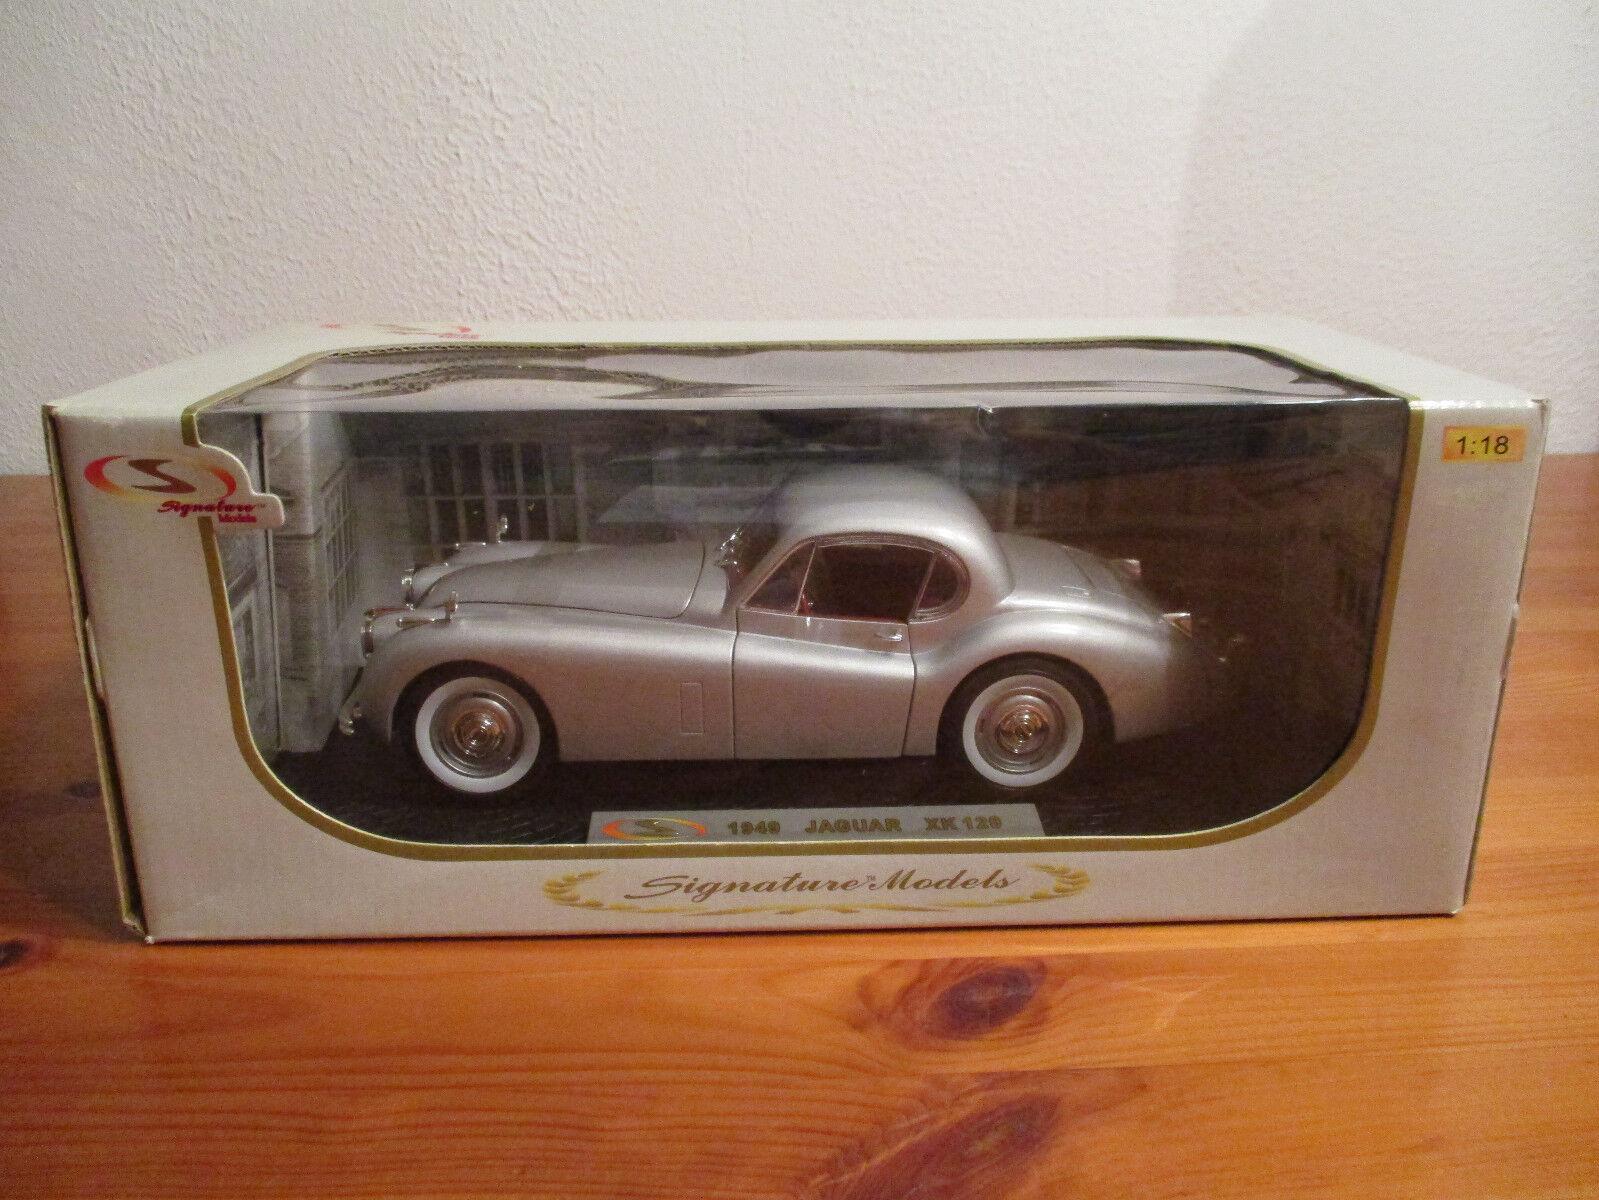 ( GO ) 1 18 Signature Models 1949 1949 1949 Jaguar XK 120 neuf emballage scellé adc546